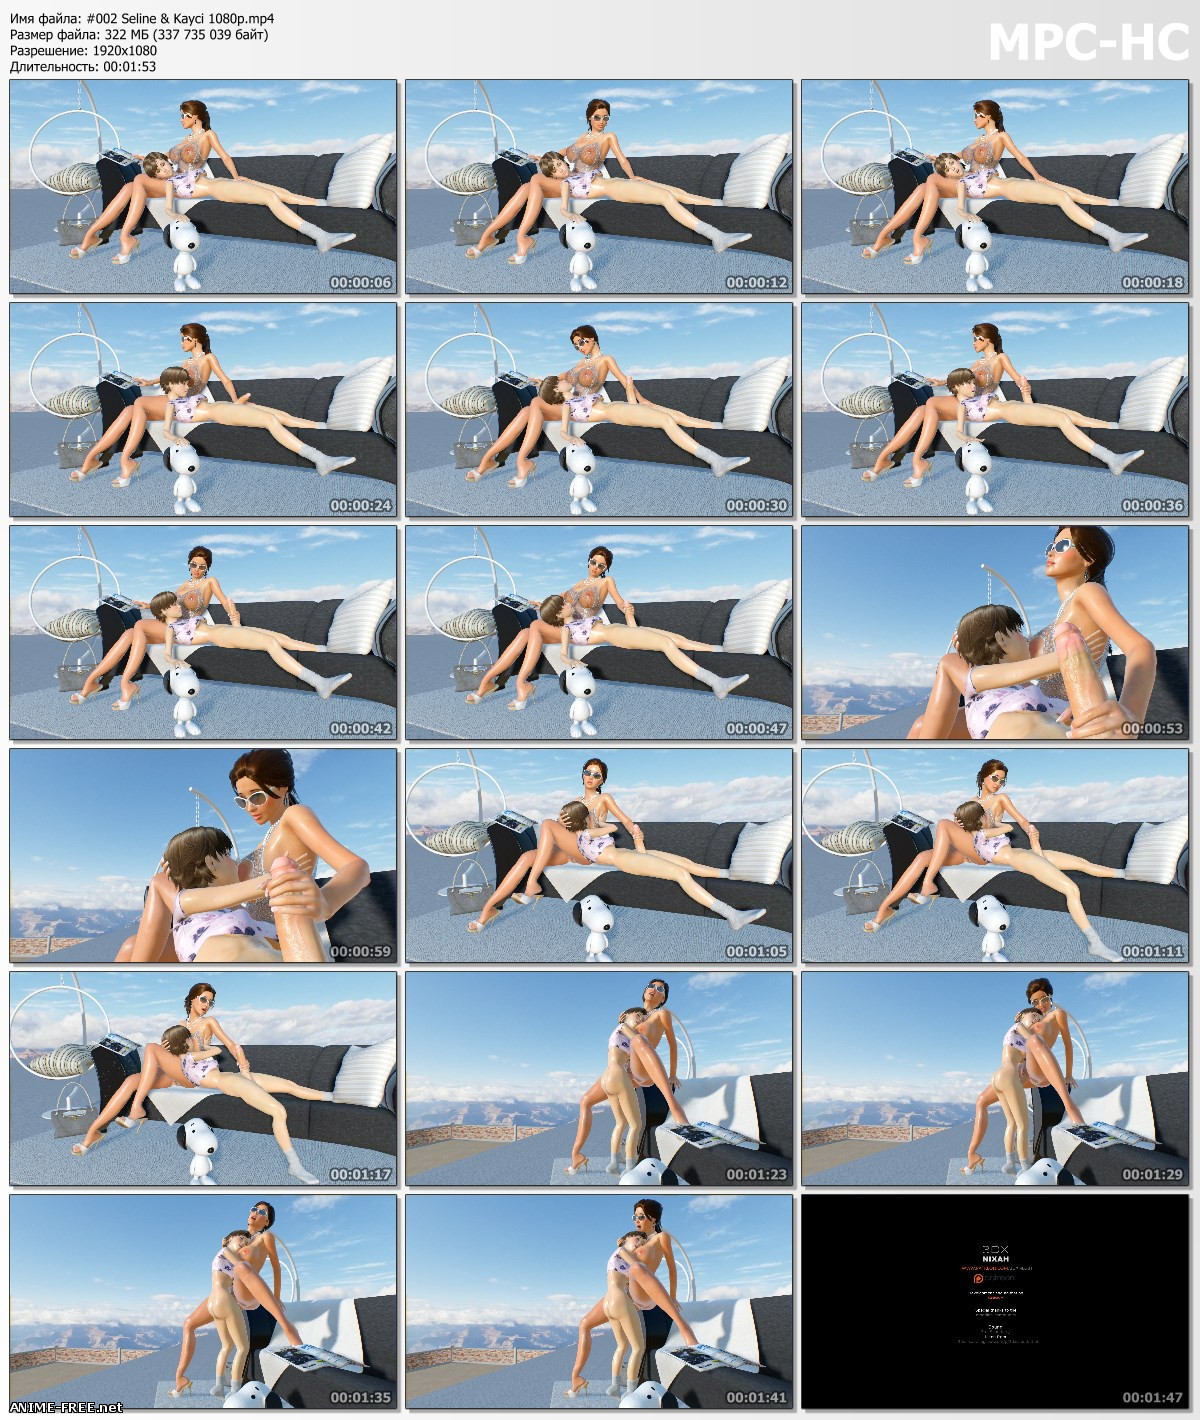 3DXNIXAH / 3DX NIXAH (Works Collection) [2017-2019] [Uncen] [HD-1080p / HD-720p] [ENG] 3D-Hentai